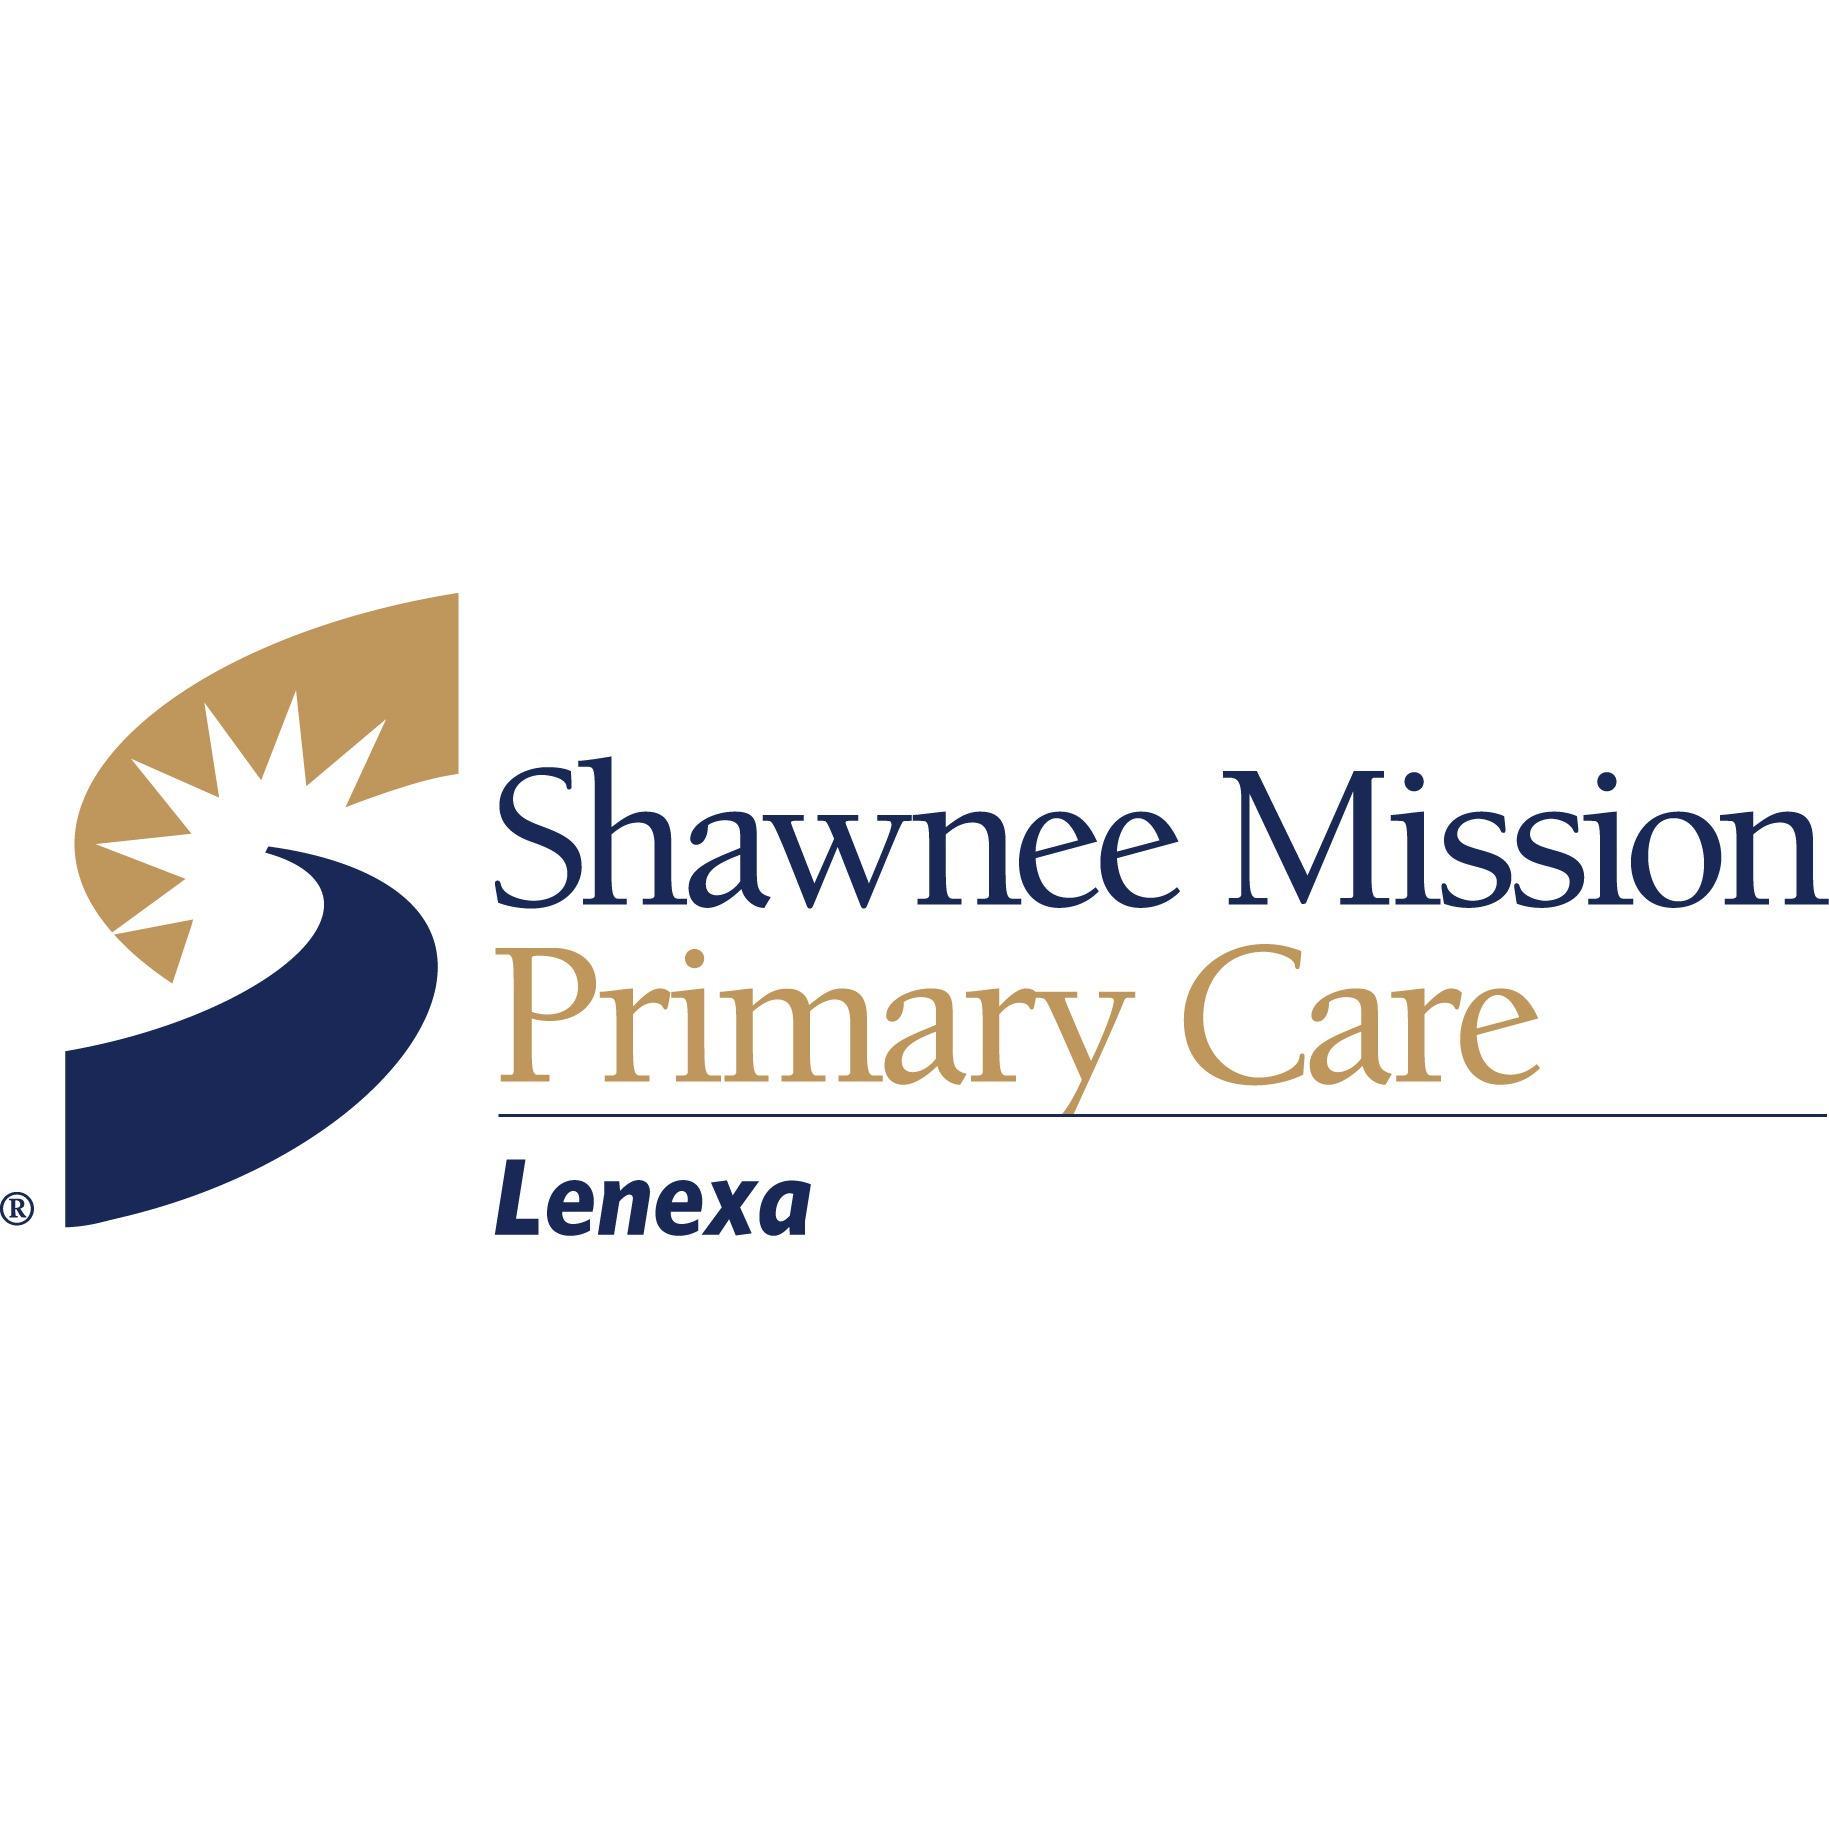 Shawnee Mission Primary Care - Lenexa - Lenexa, KS - General or Family Practice Physicians